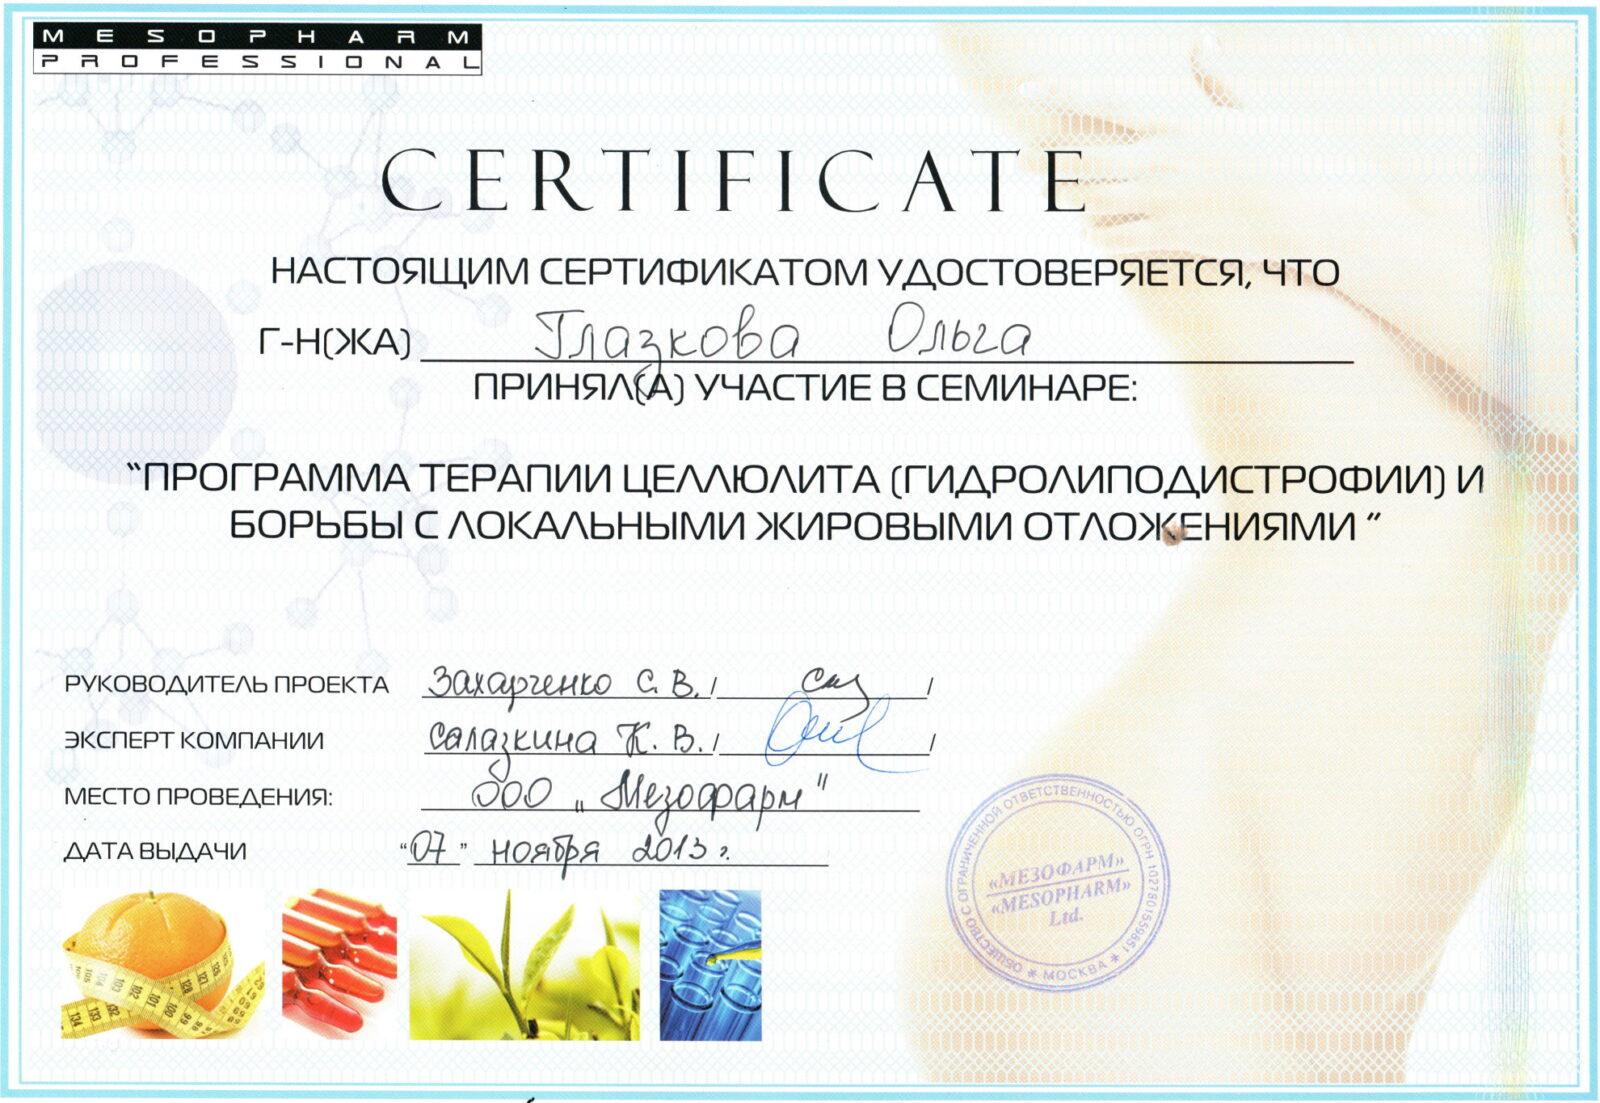 2013.11.07 Сертификат